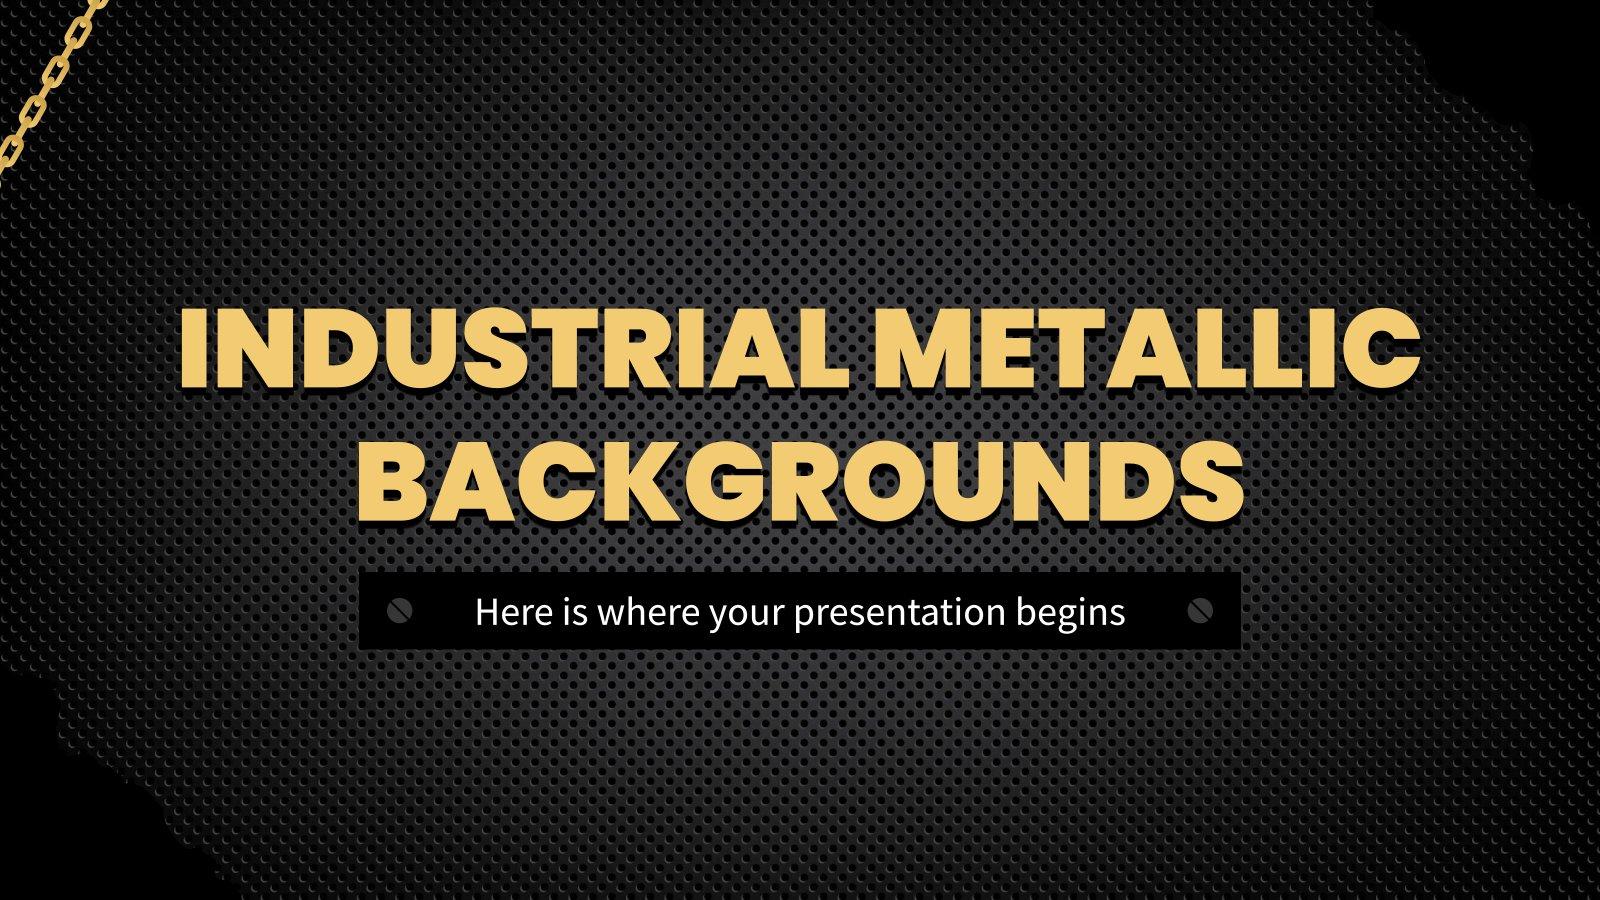 Industrial Metallic Backgrounds presentation template